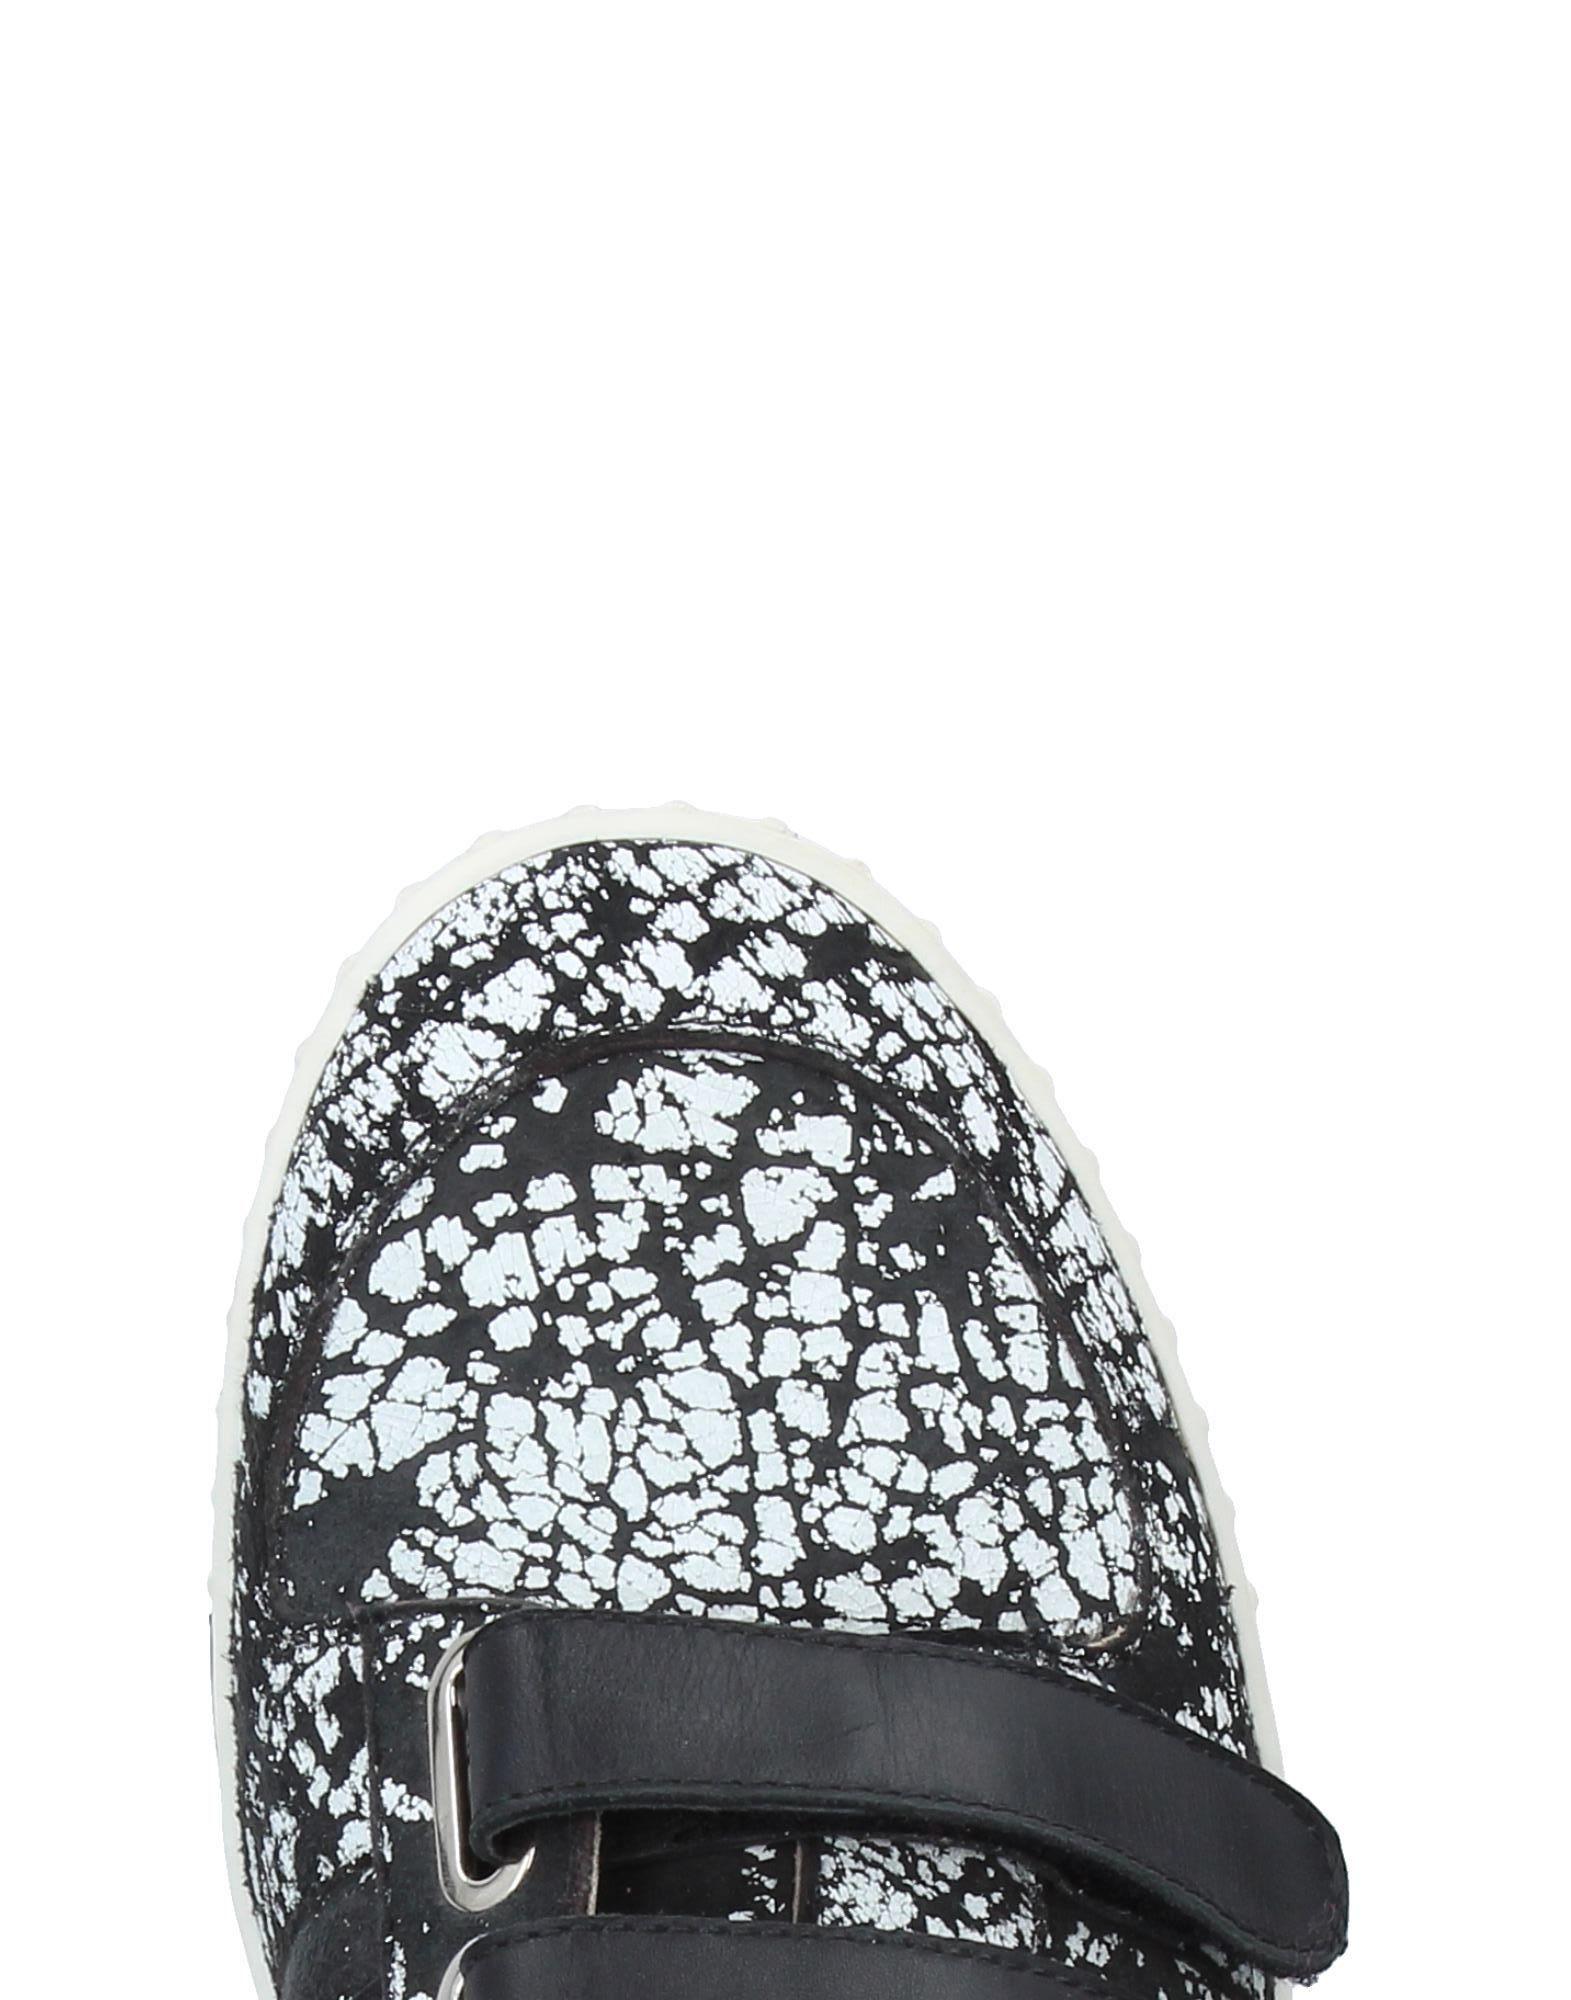 Alessandro Dell'acqua Sneakers Herren  11408072EO Neue Neue Neue Schuhe f740e2